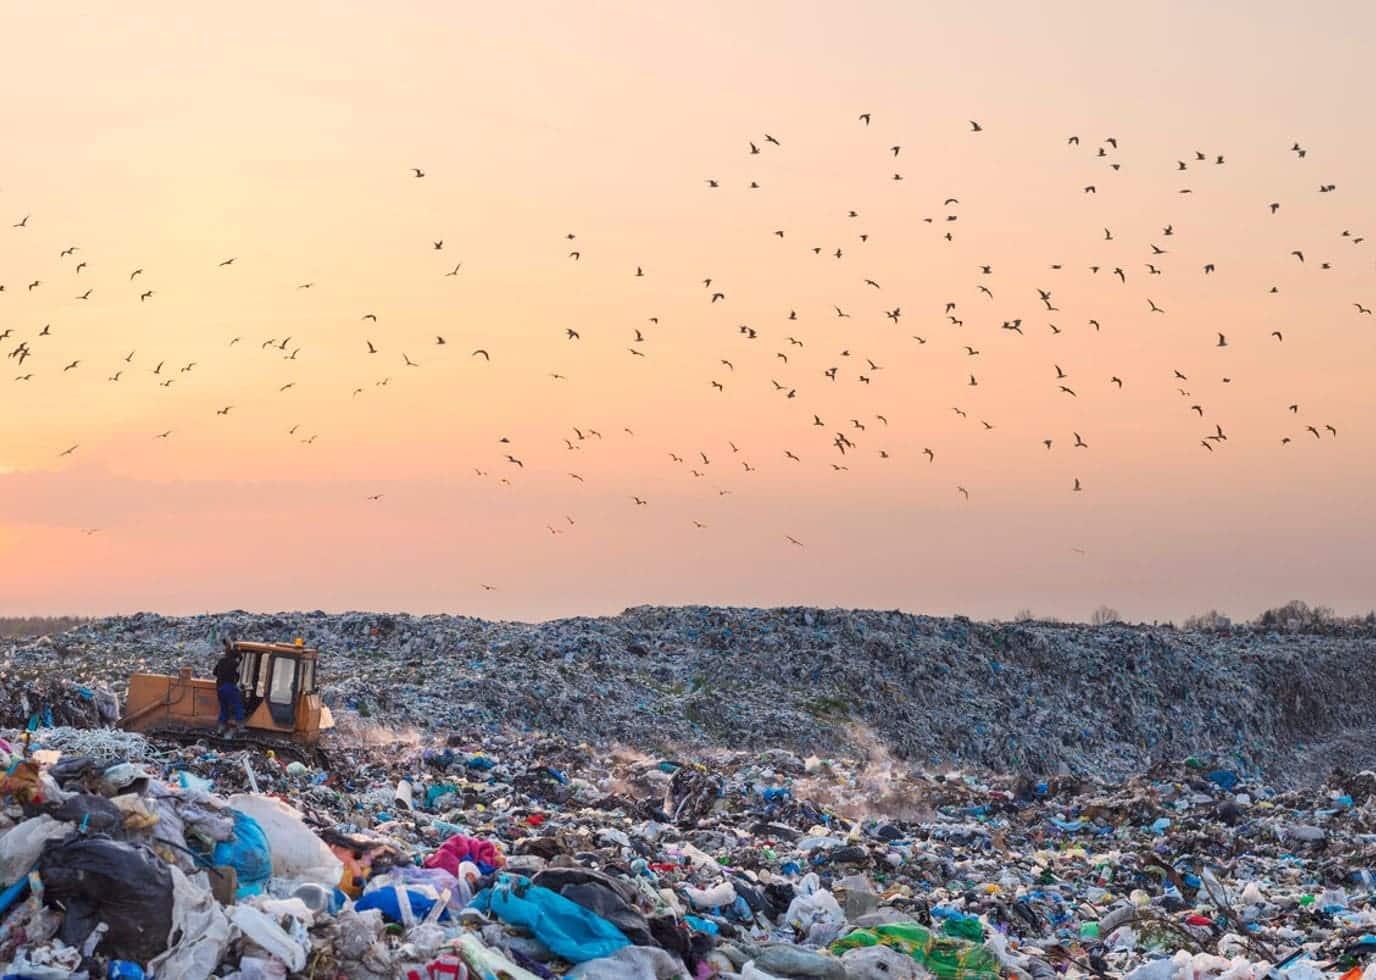 Waste_management_landfill